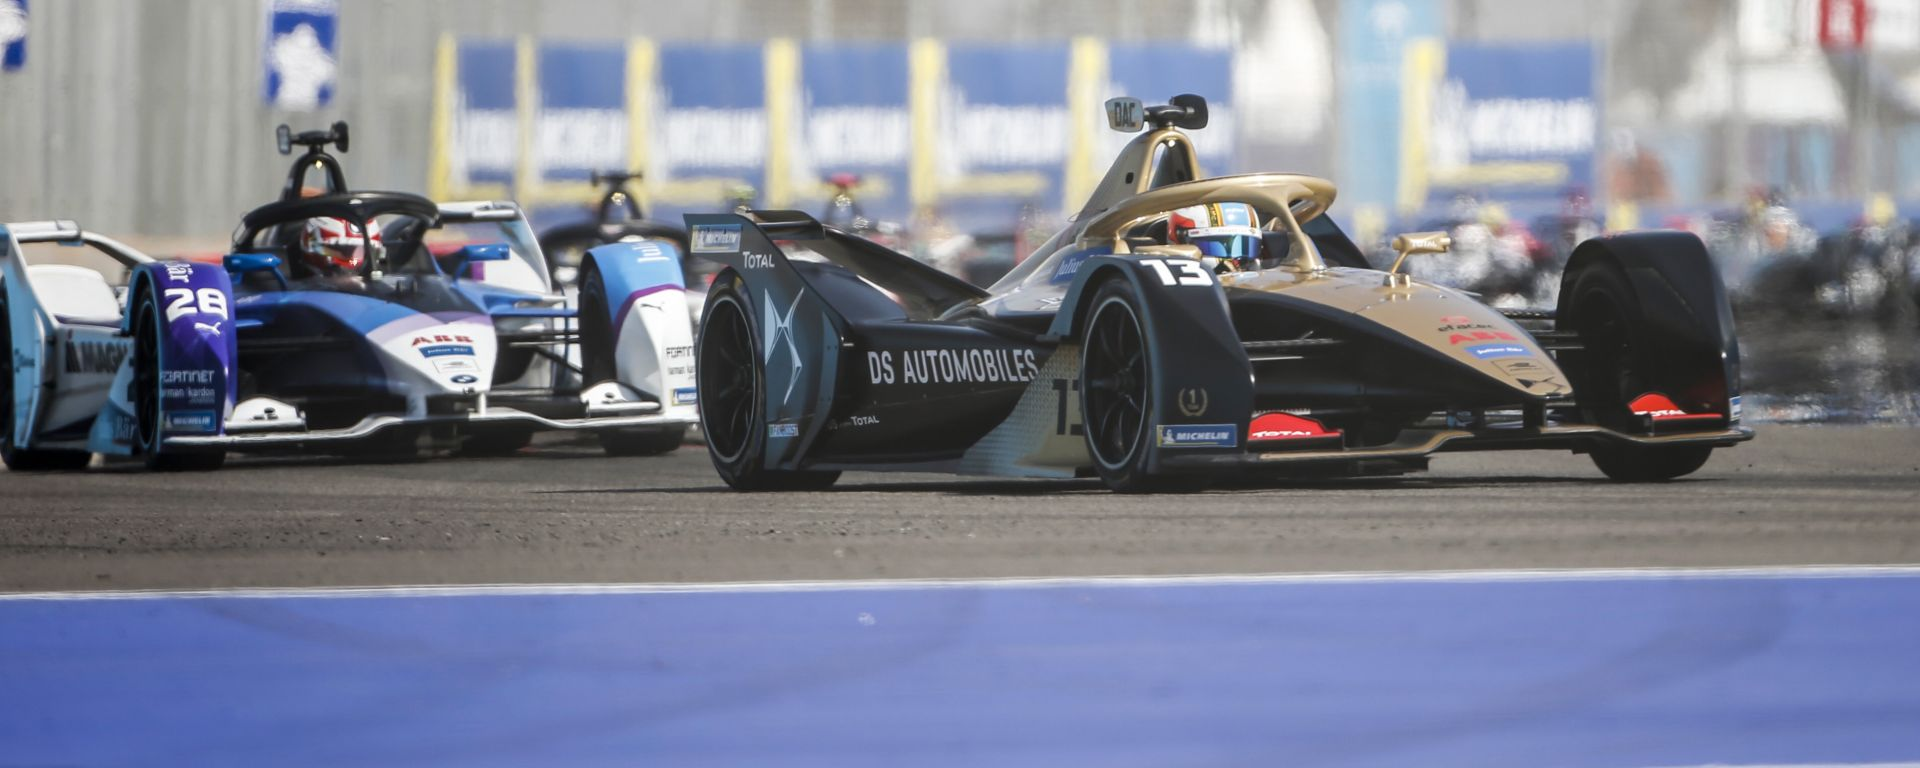 Formula E ePrix Marrakech 2020: le prime fasi di gara con Da Costa (DS Techeetah) davanti a Gunther (BMW)